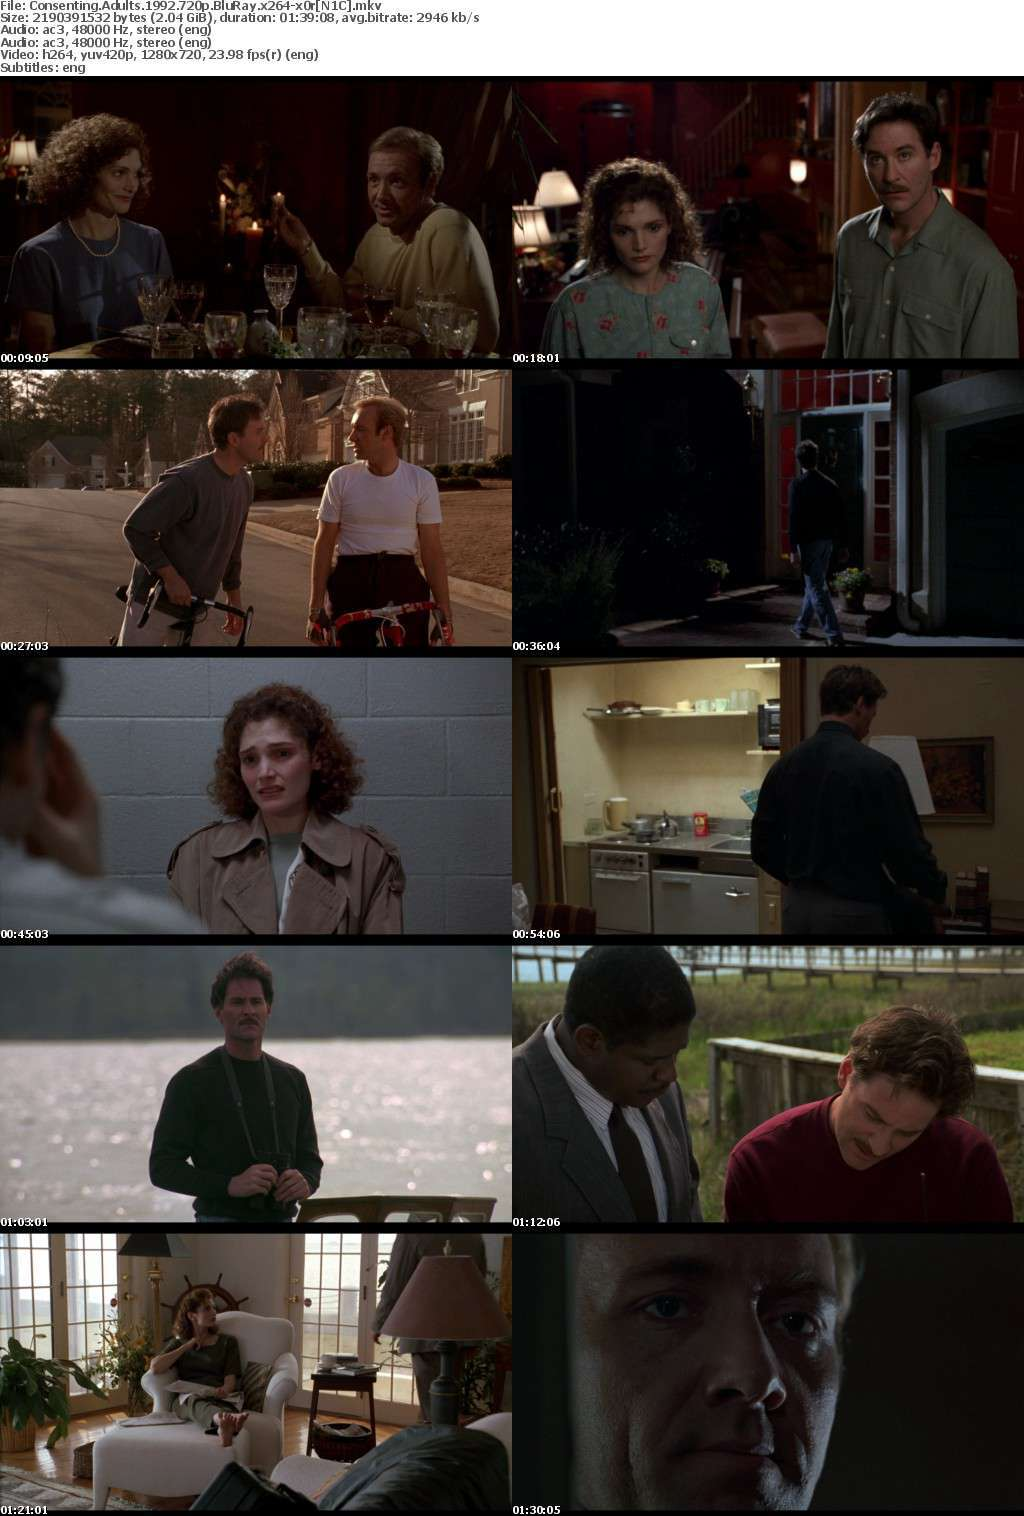 Consenting Adults (1992) 720p BluRay x264-x0r